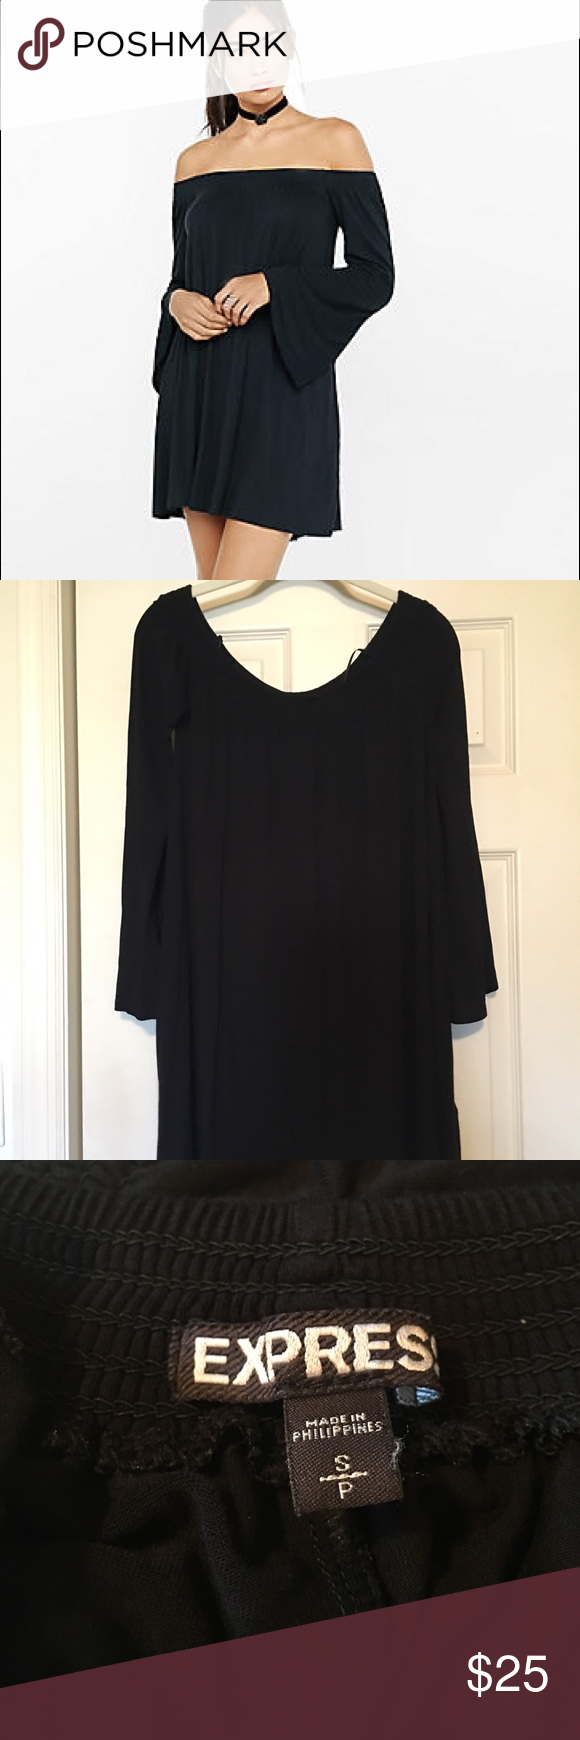 Worn once! Express bell sleeve off shoulder dress! Excellent condition, worn once! Express bell sleeve boho off the shoulder dress. 96% rayon, 4% spandex. Express Dresses Midi